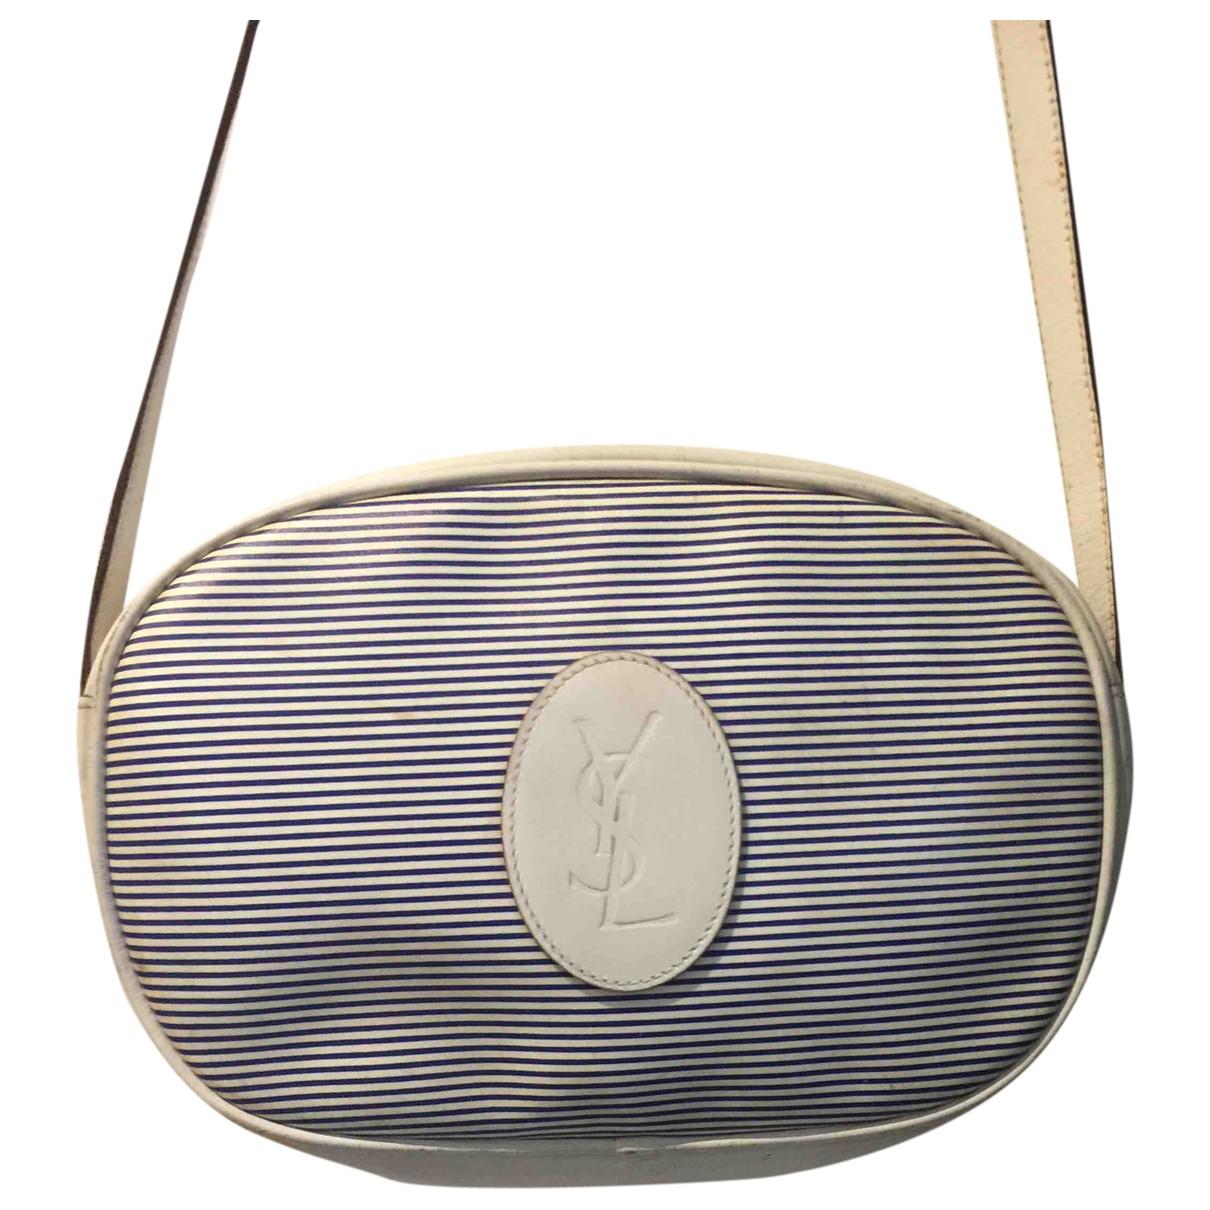 Yves Saint Laurent \N White Leather Clutch bag for Women \N